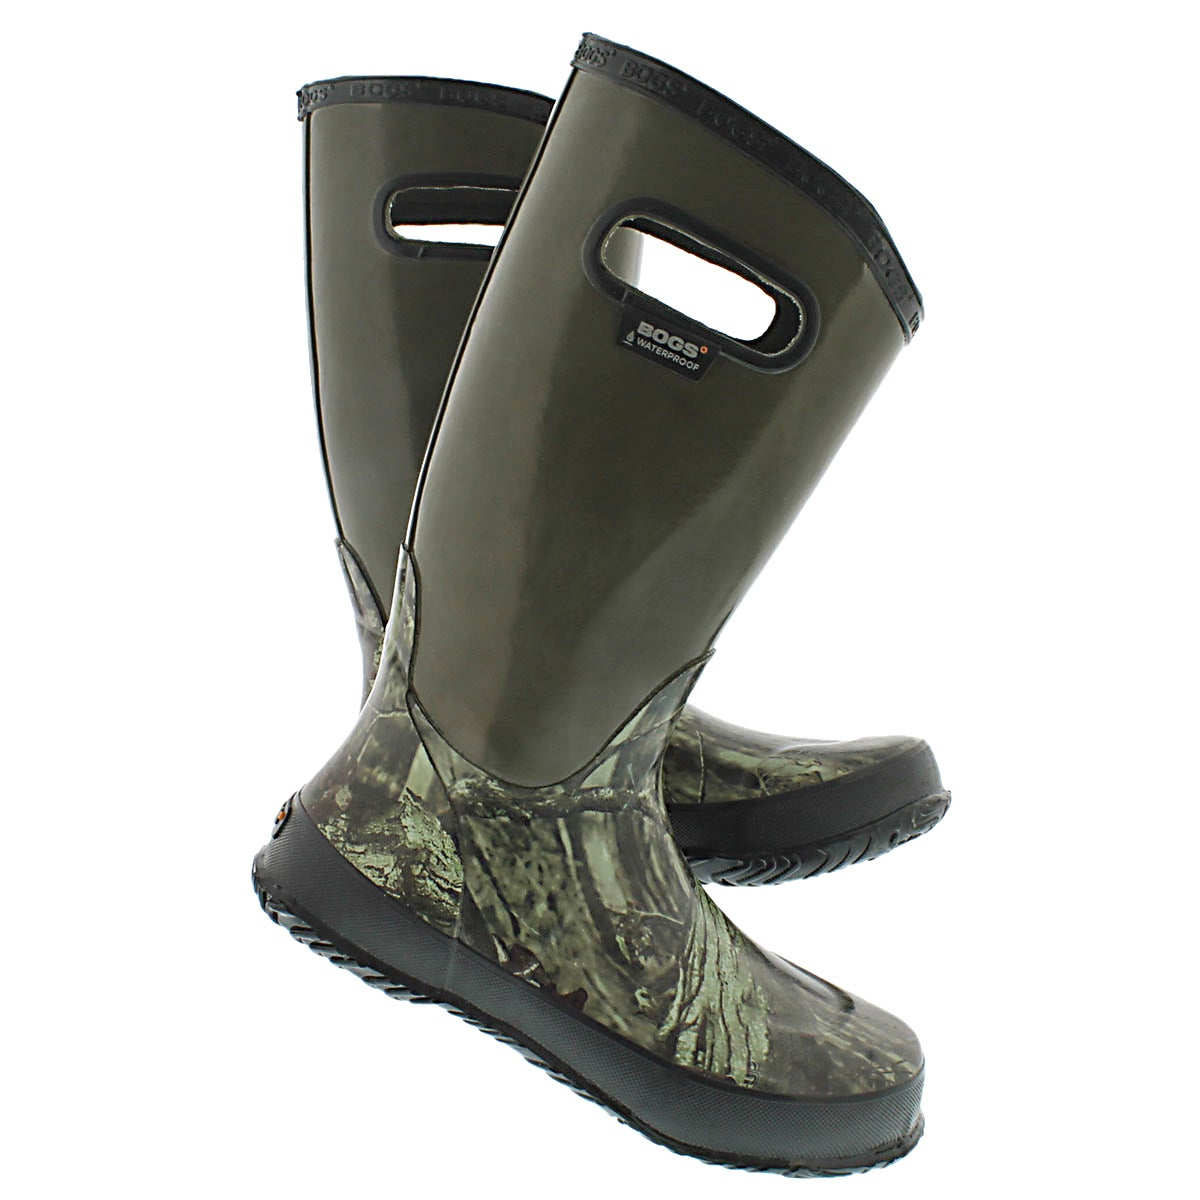 Bys Hunting mossy rain boot